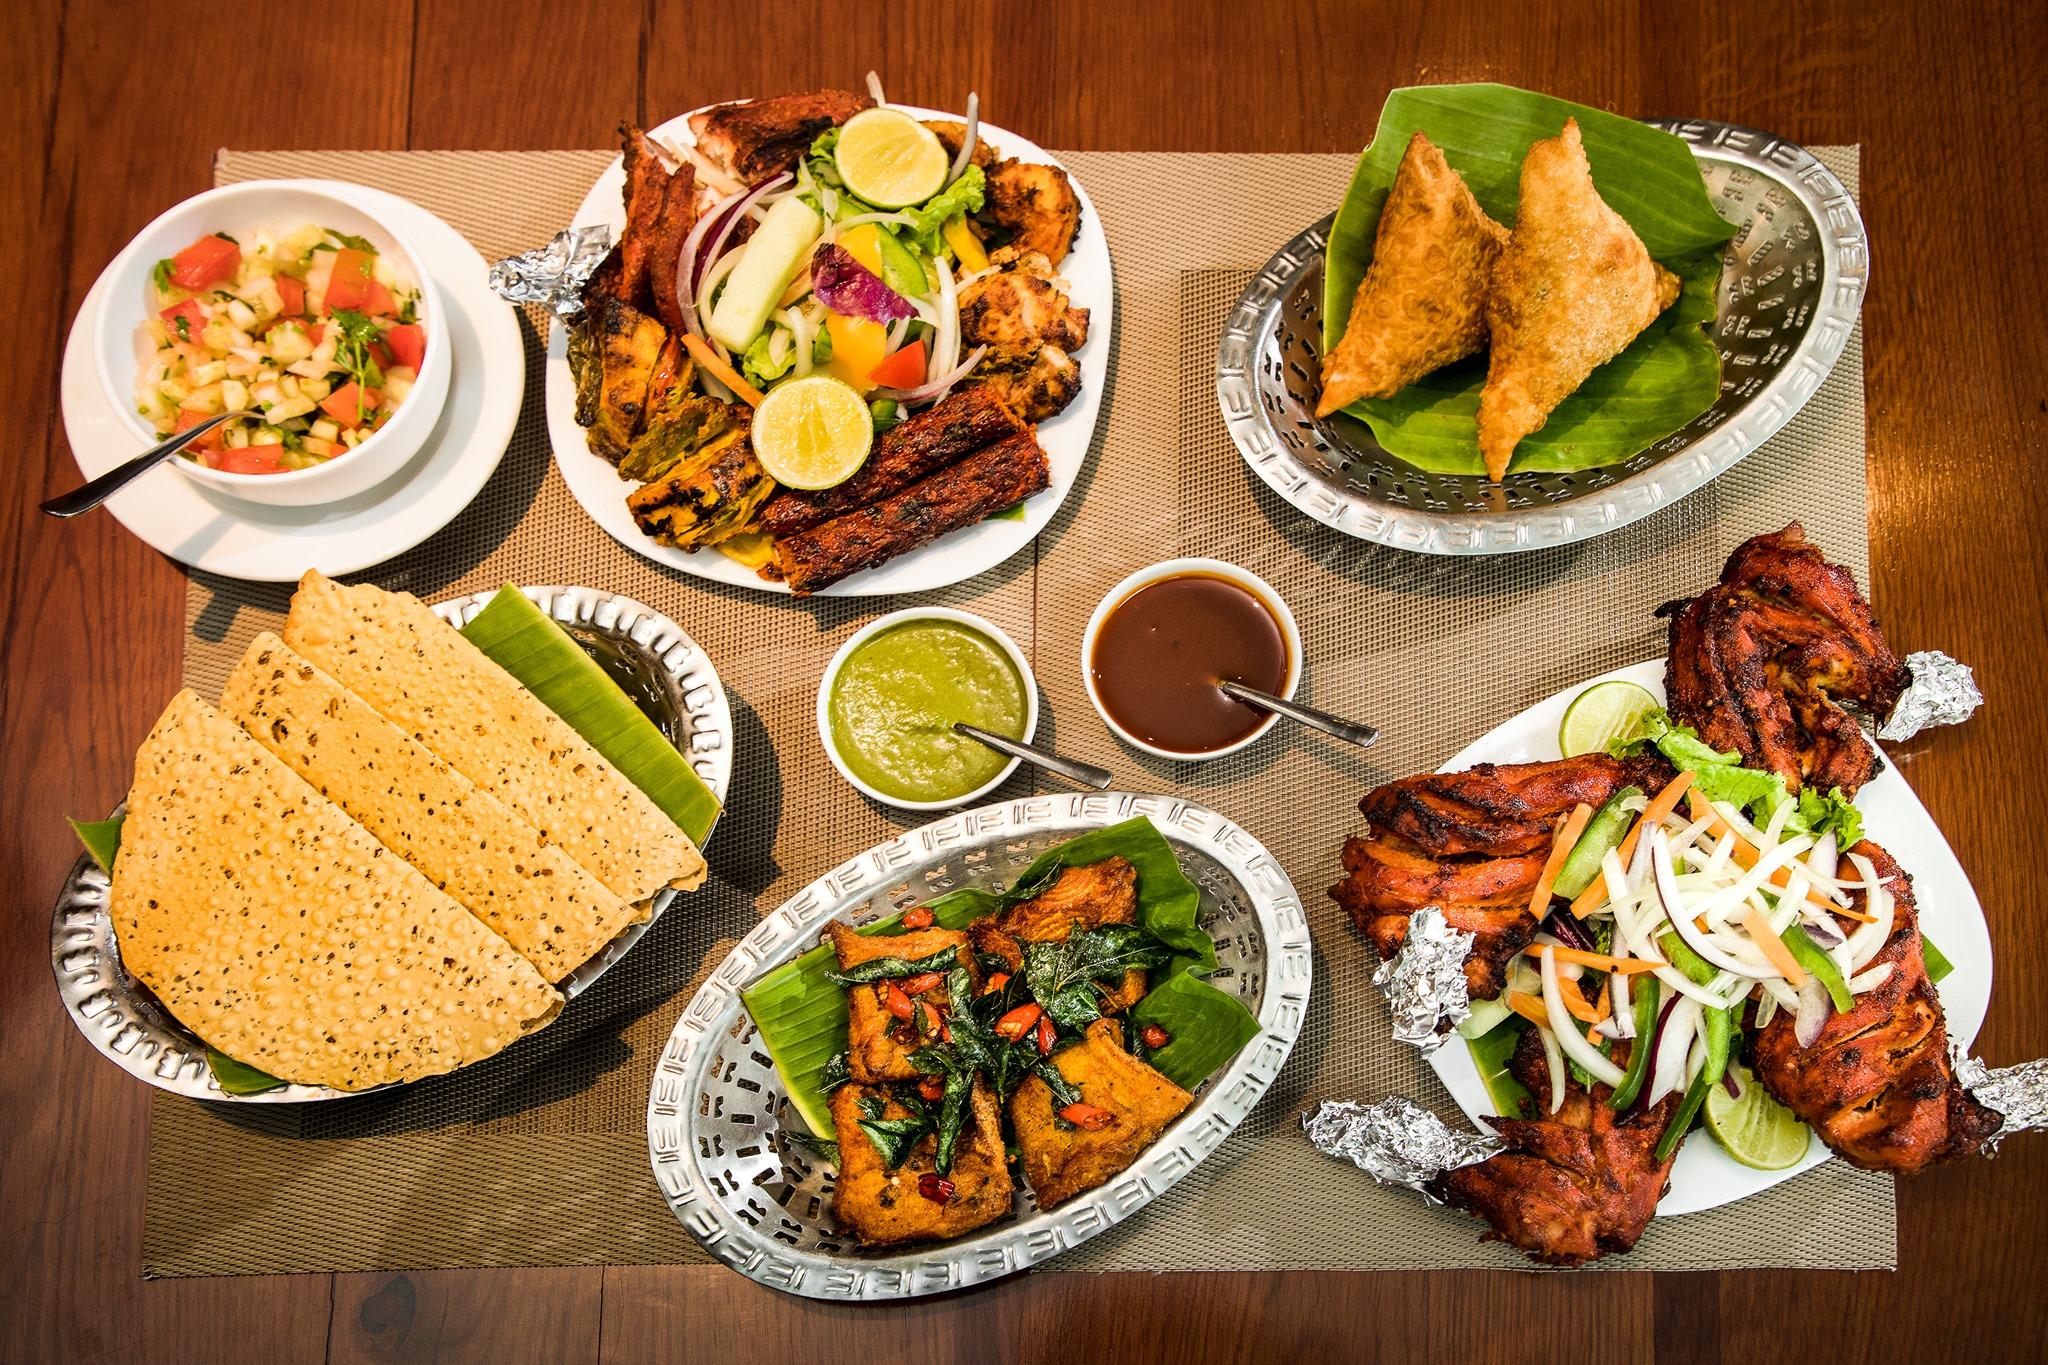 Indian & South Asian restaurants - Tandoor restaurant - Indian food